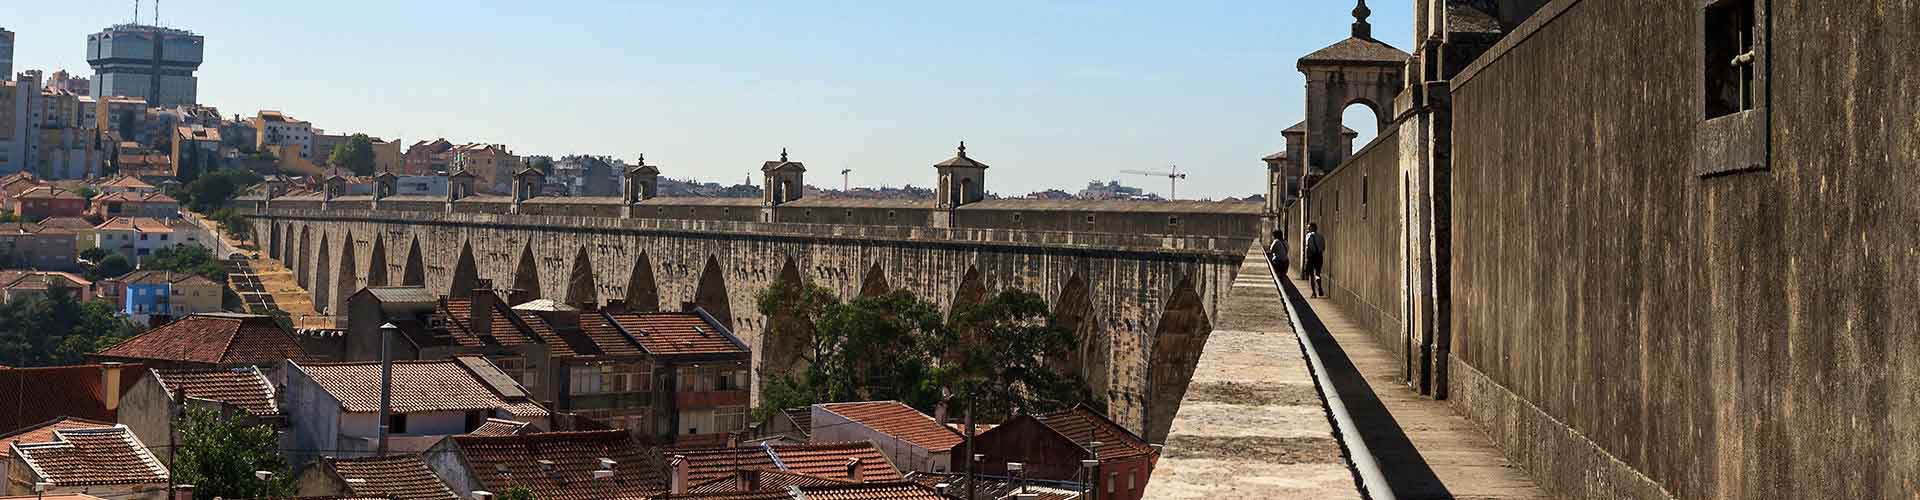 Lisboa - Hostales cerca a Águas Livres Acueducto. Mapas de Lisboa, Fotos y comentarios de cada Hostal en Lisboa.